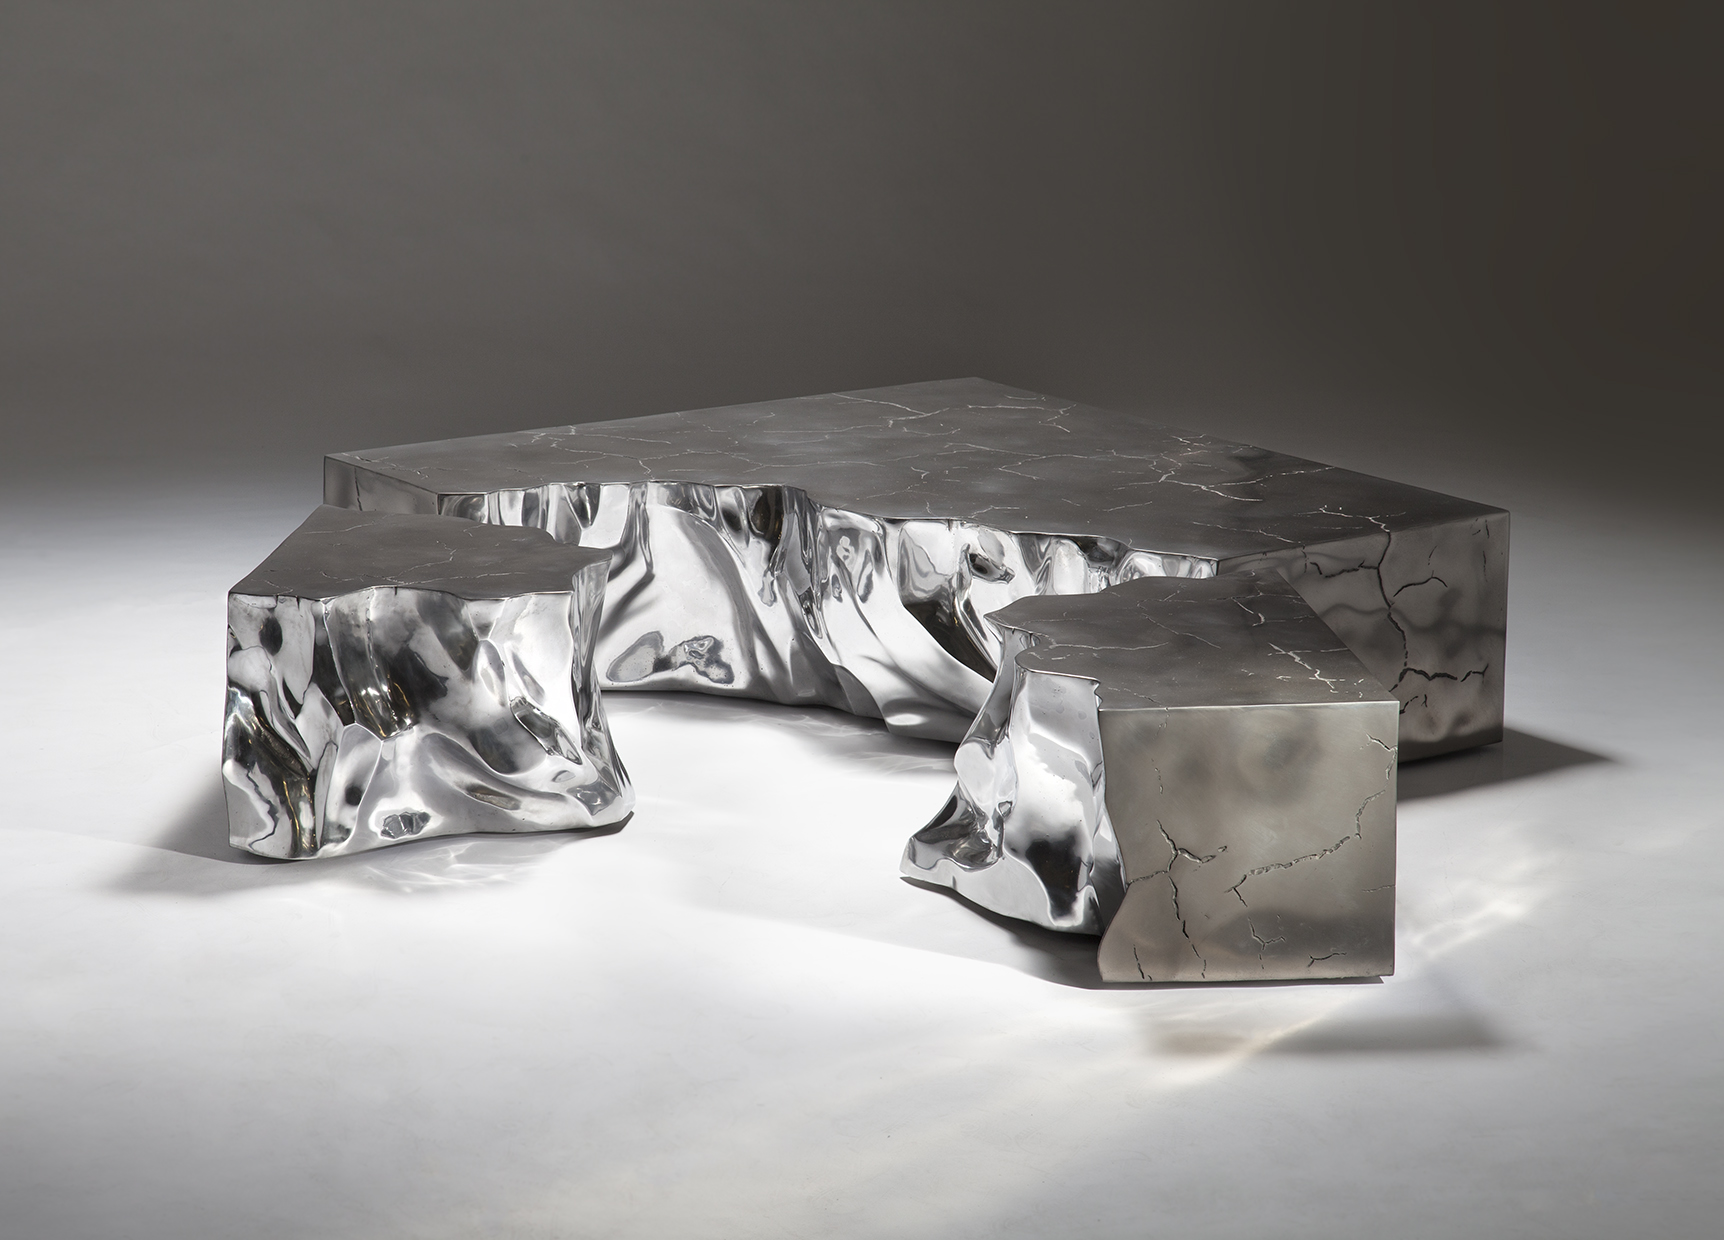 bu_00983_fragmented crack_aluminium_coffee table_A.jpg